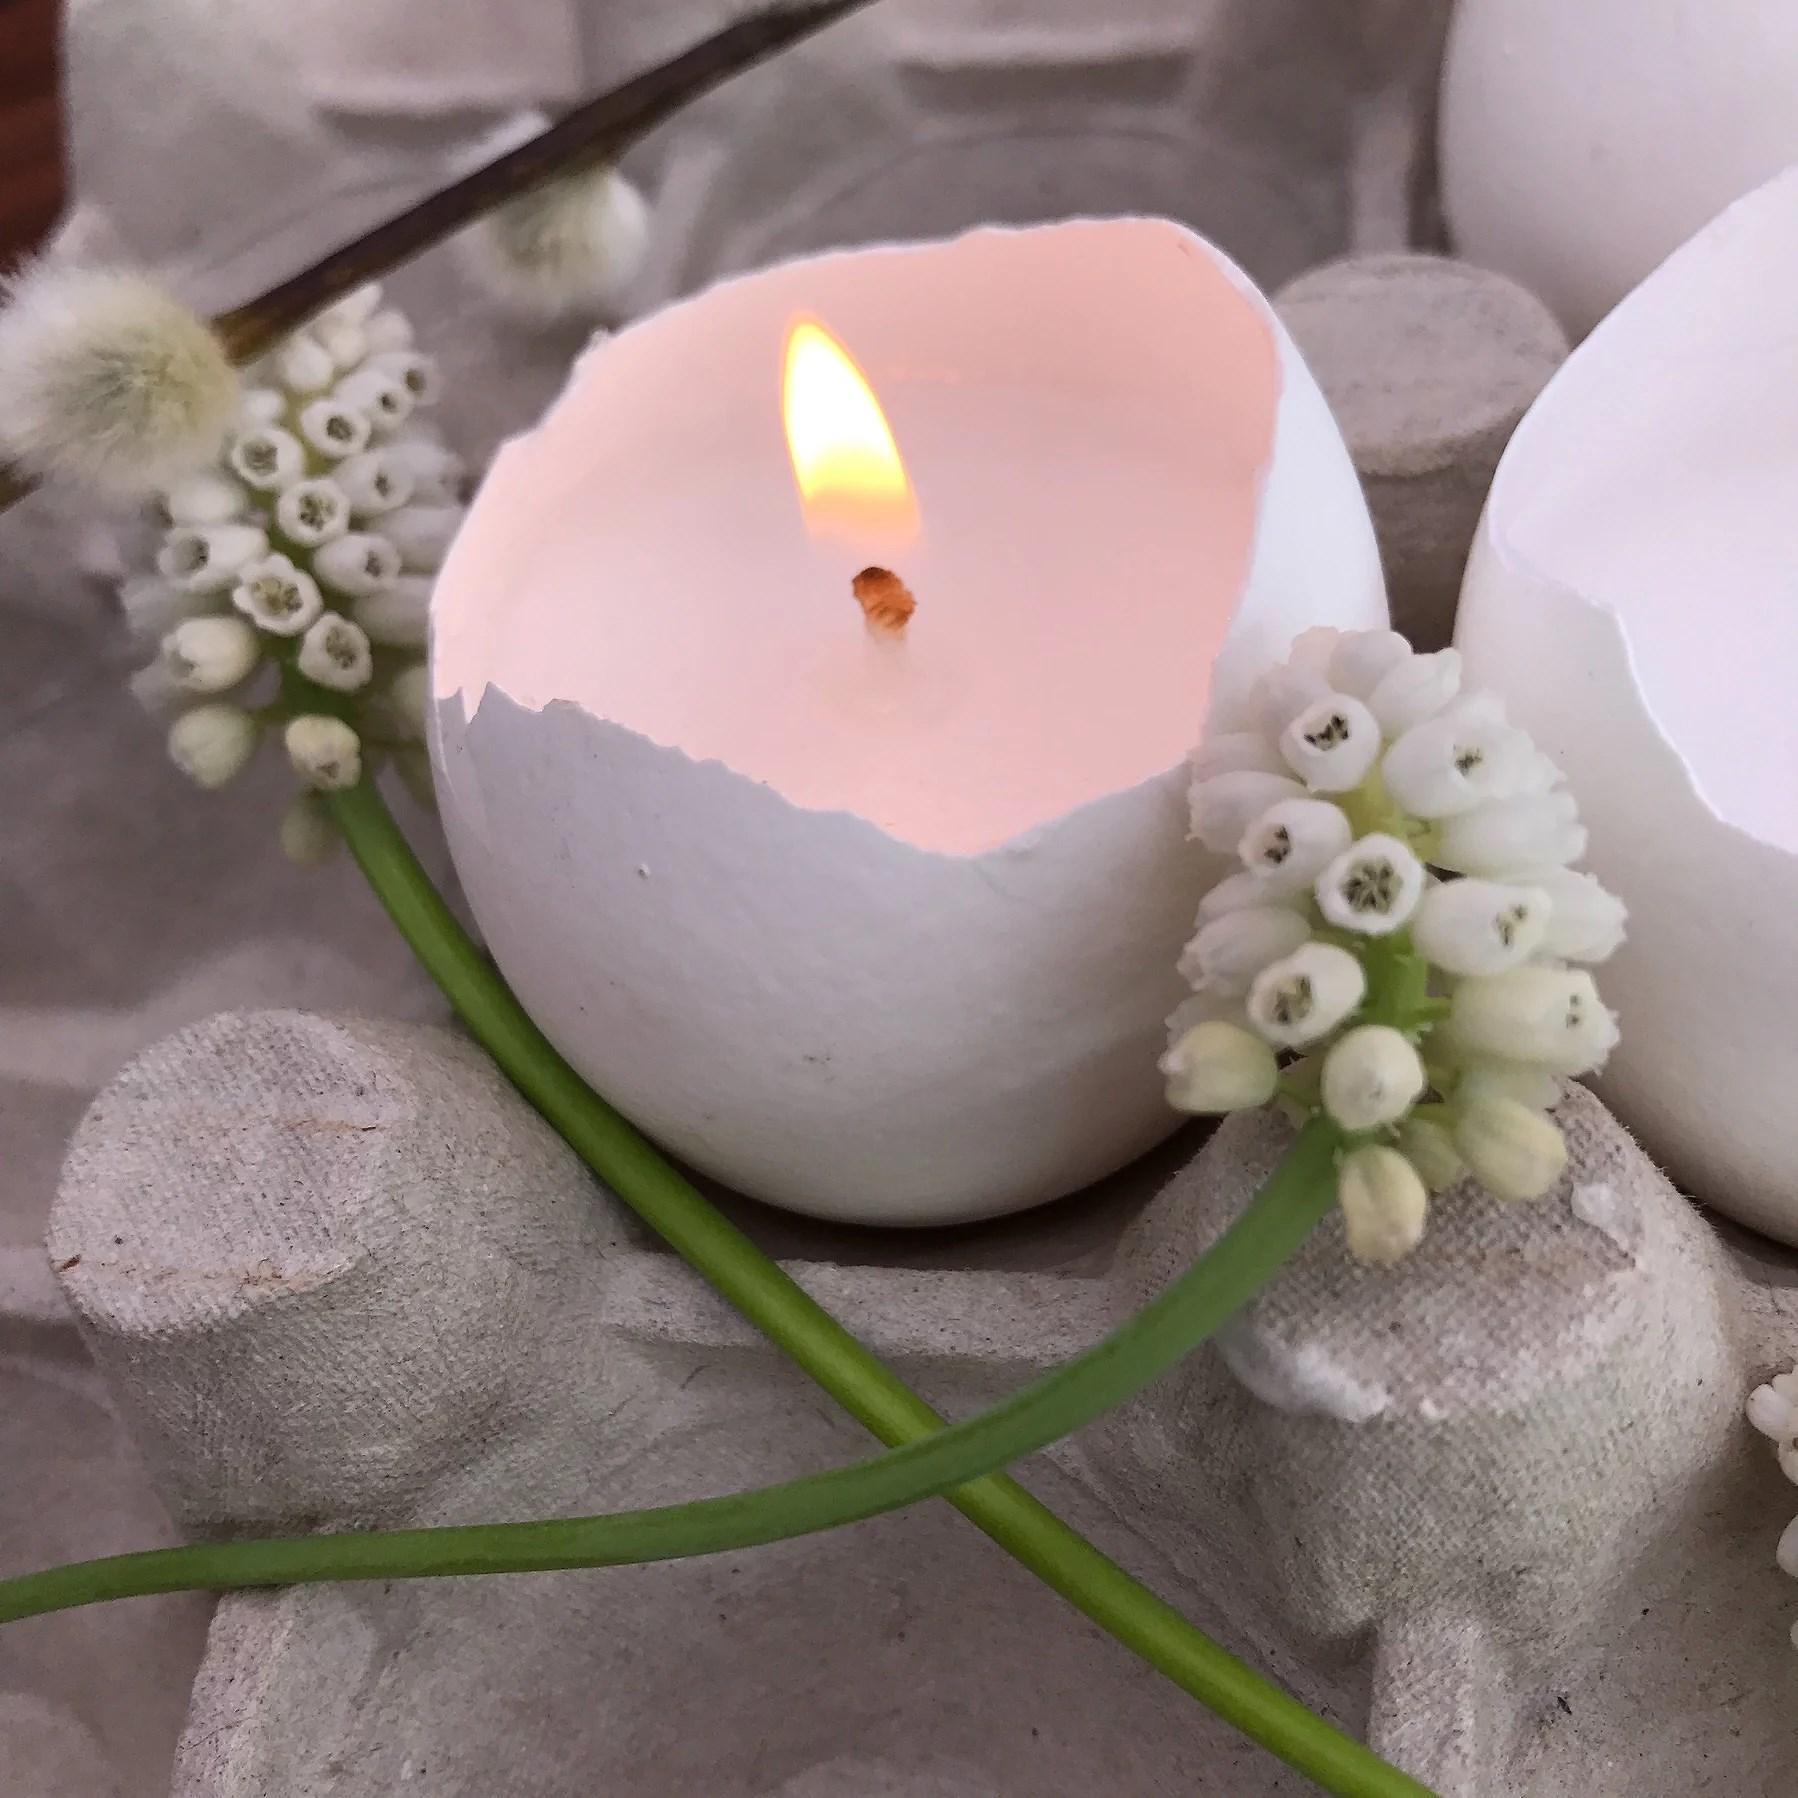 Påskdekoration med äggskal. Gör dina egna påskdekorationer. Påskpyssel. Pyssla med äggskal till påsk. Gå bort-present i påsk. Ljus i äggskal.